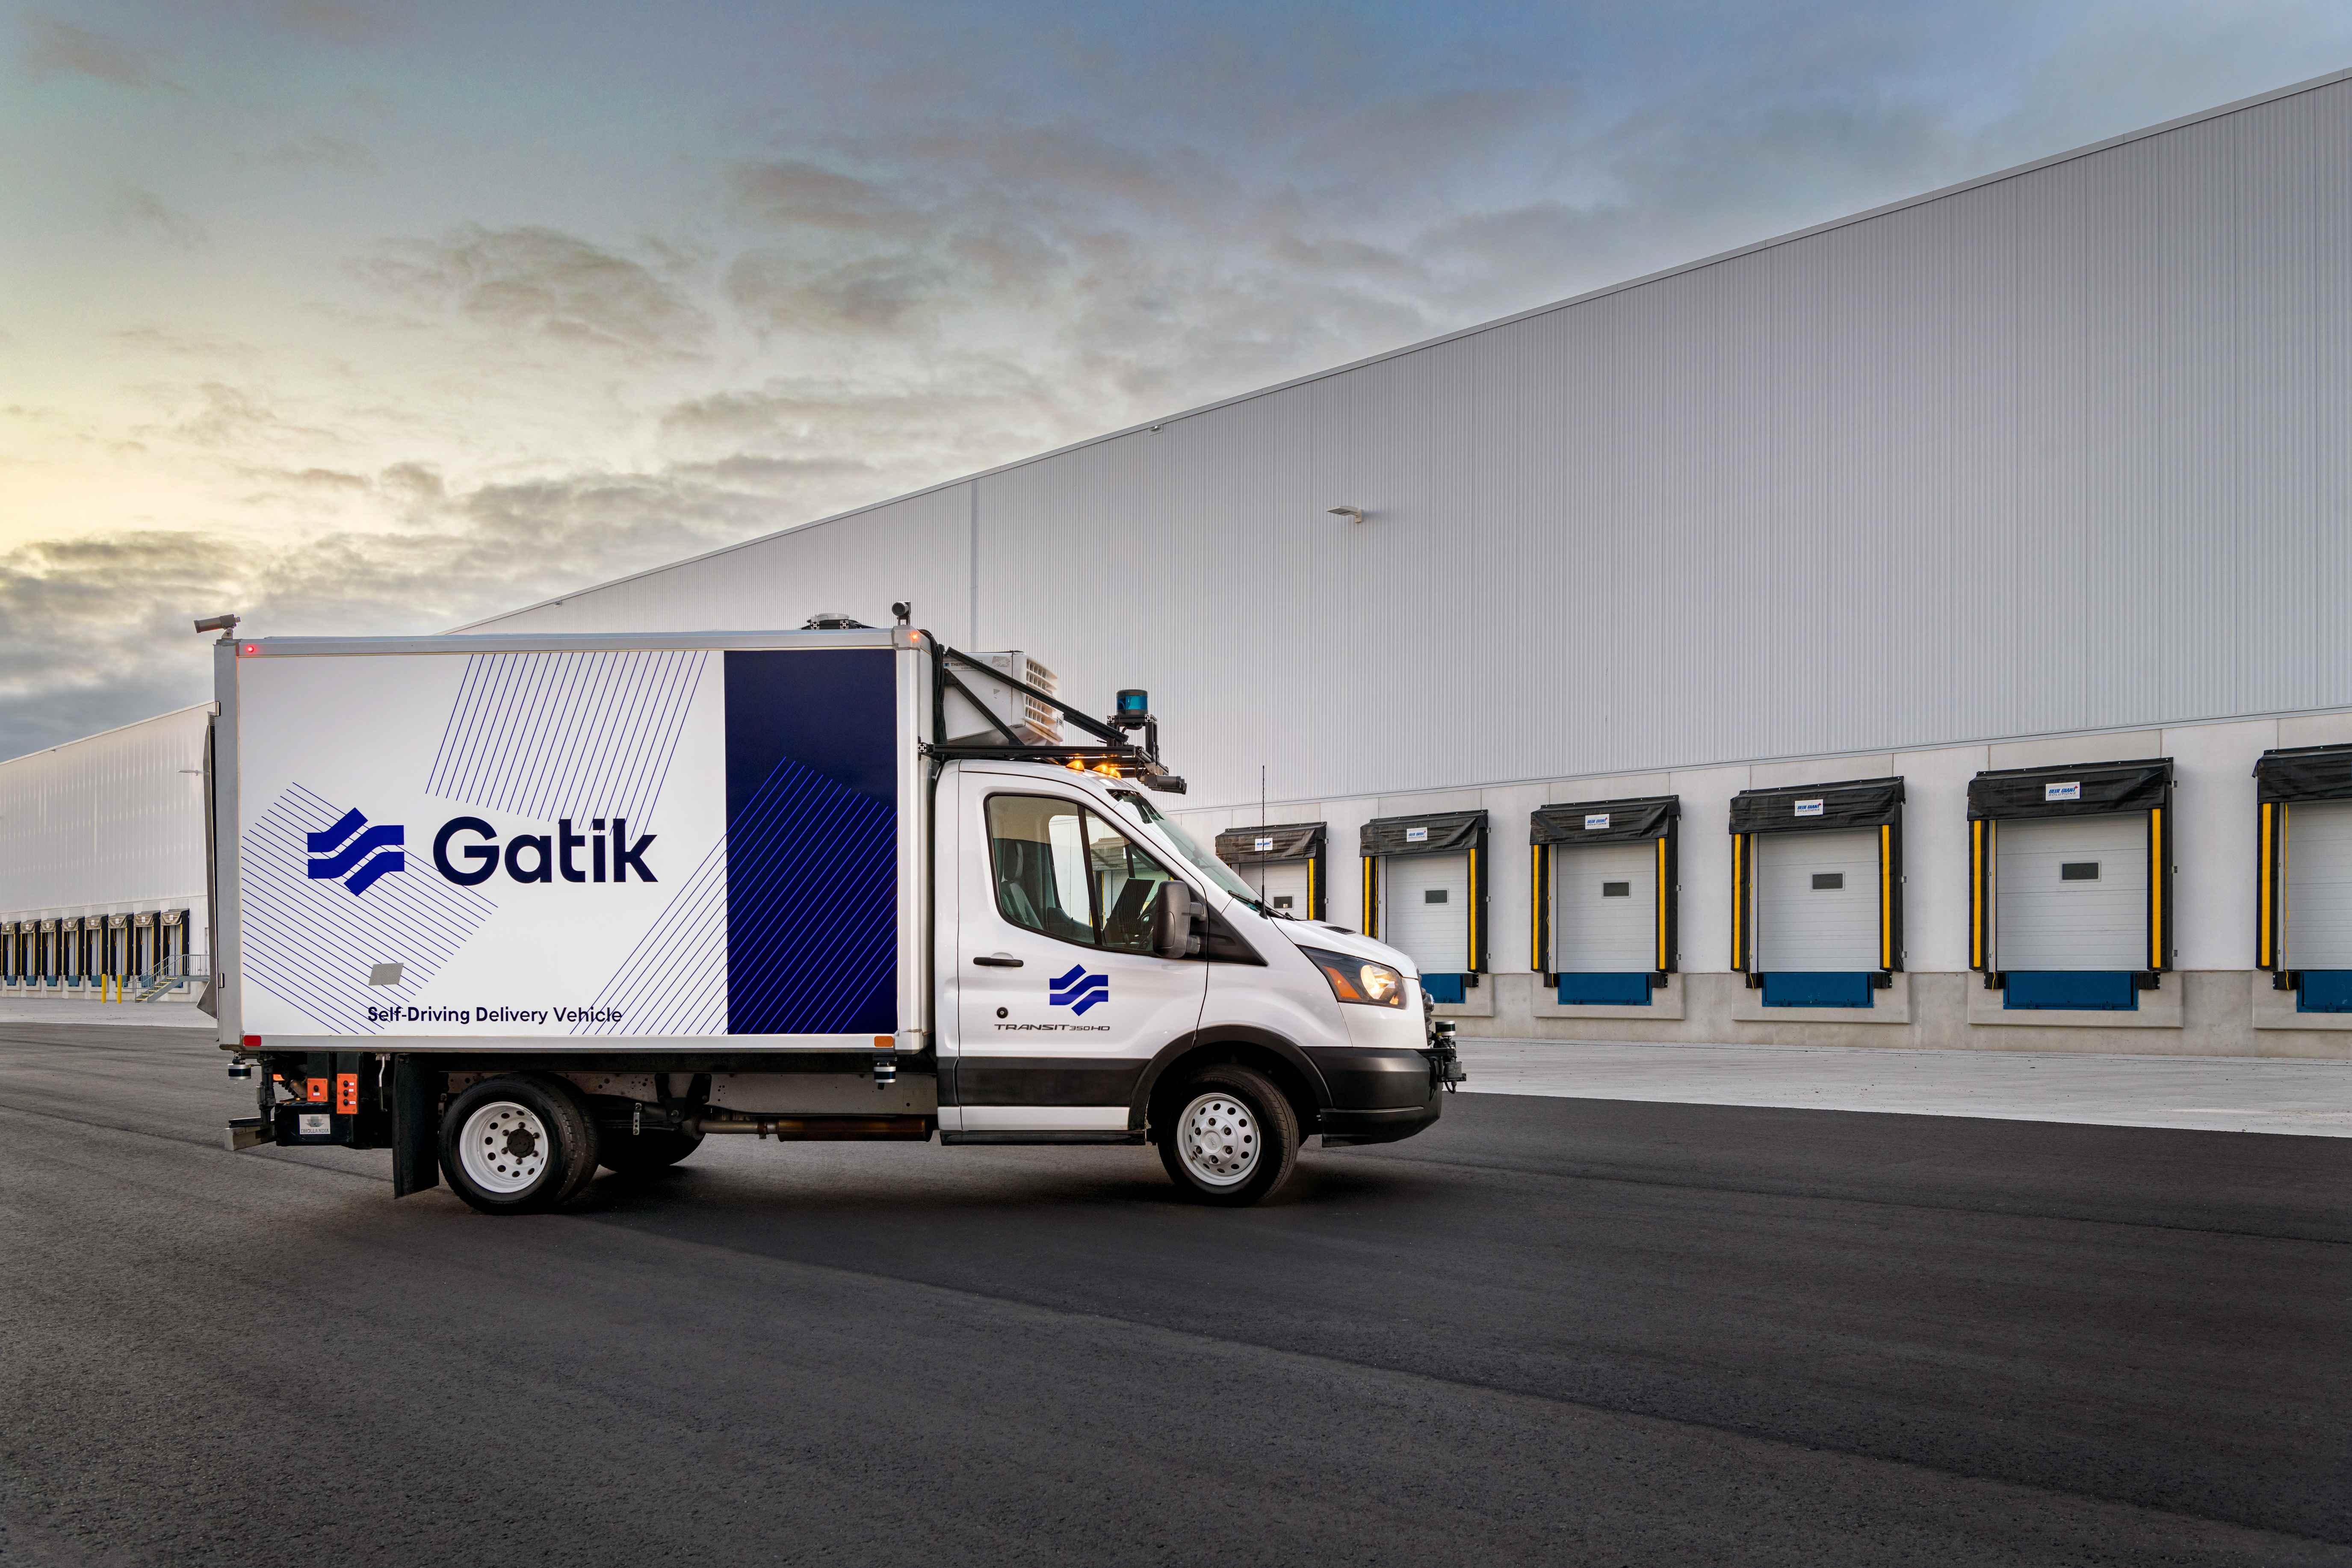 Gatik Raises $25m Series A Funding Round